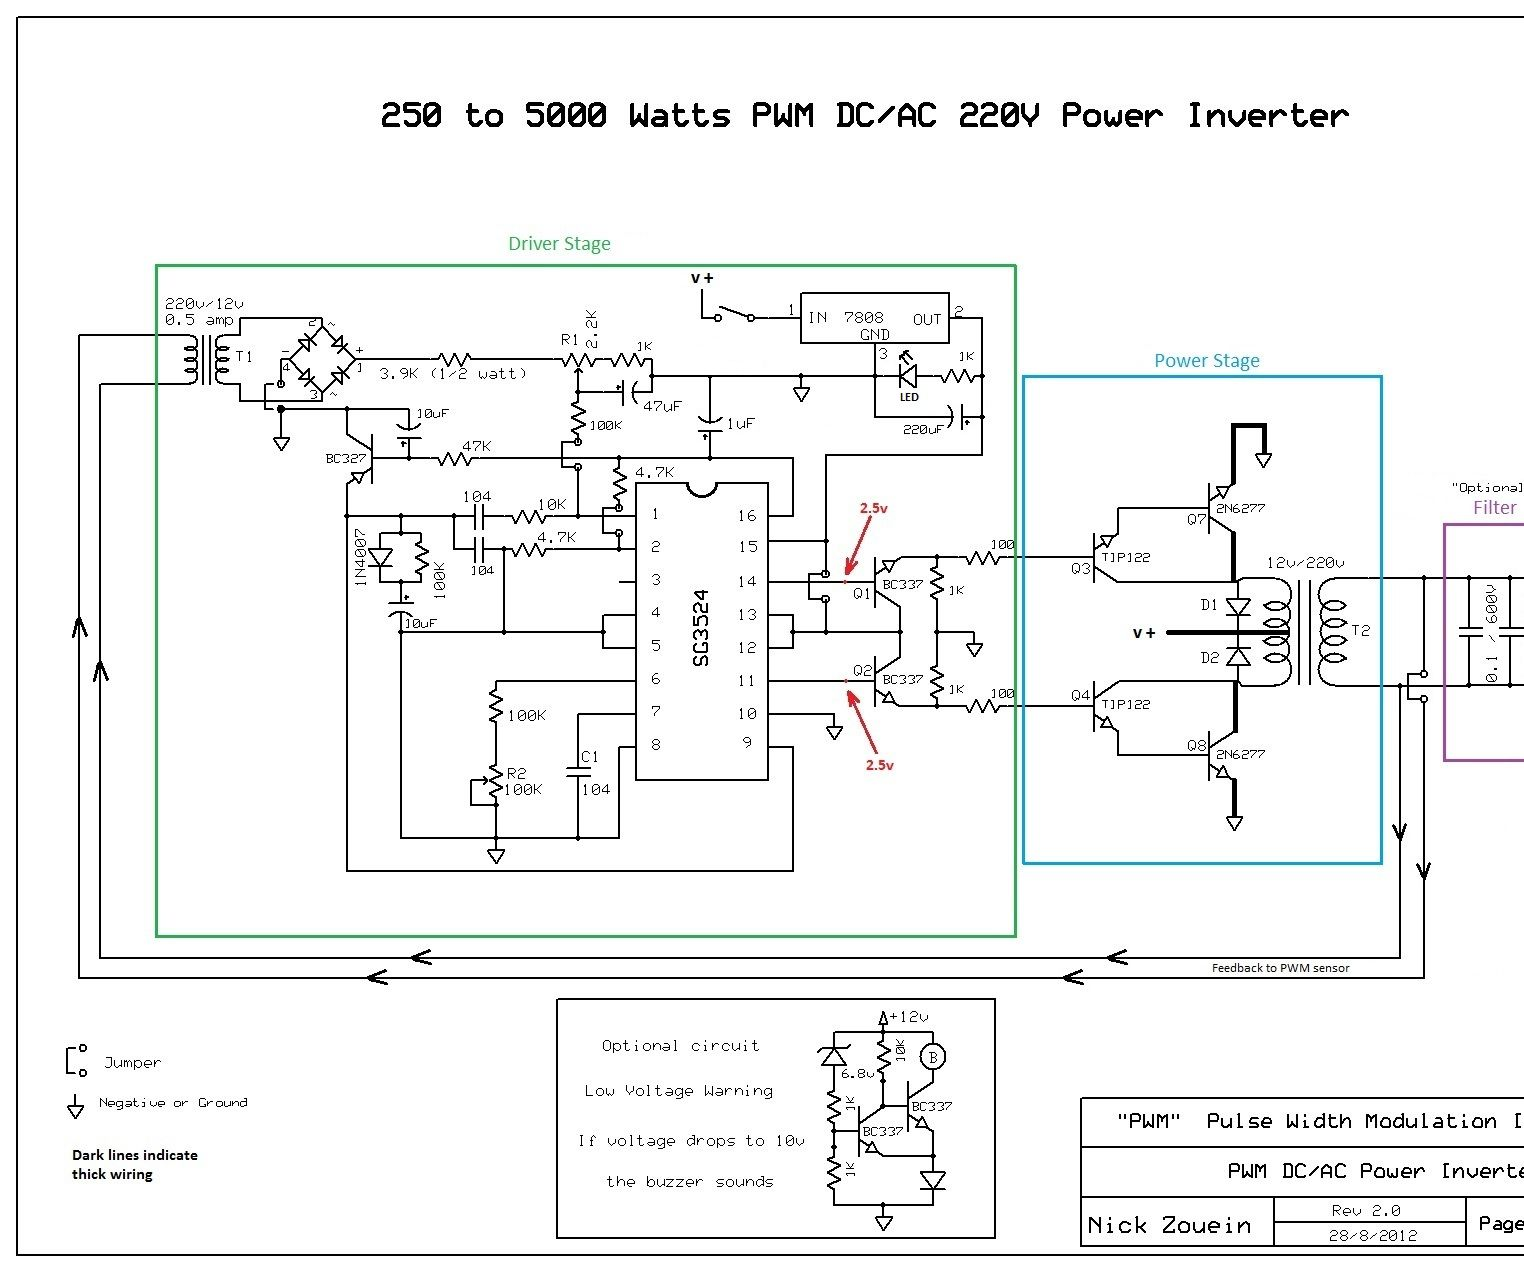 automated logic wiring diagram wiring libraryautomated logic wiring diagram [ 1524 x 1270 Pixel ]